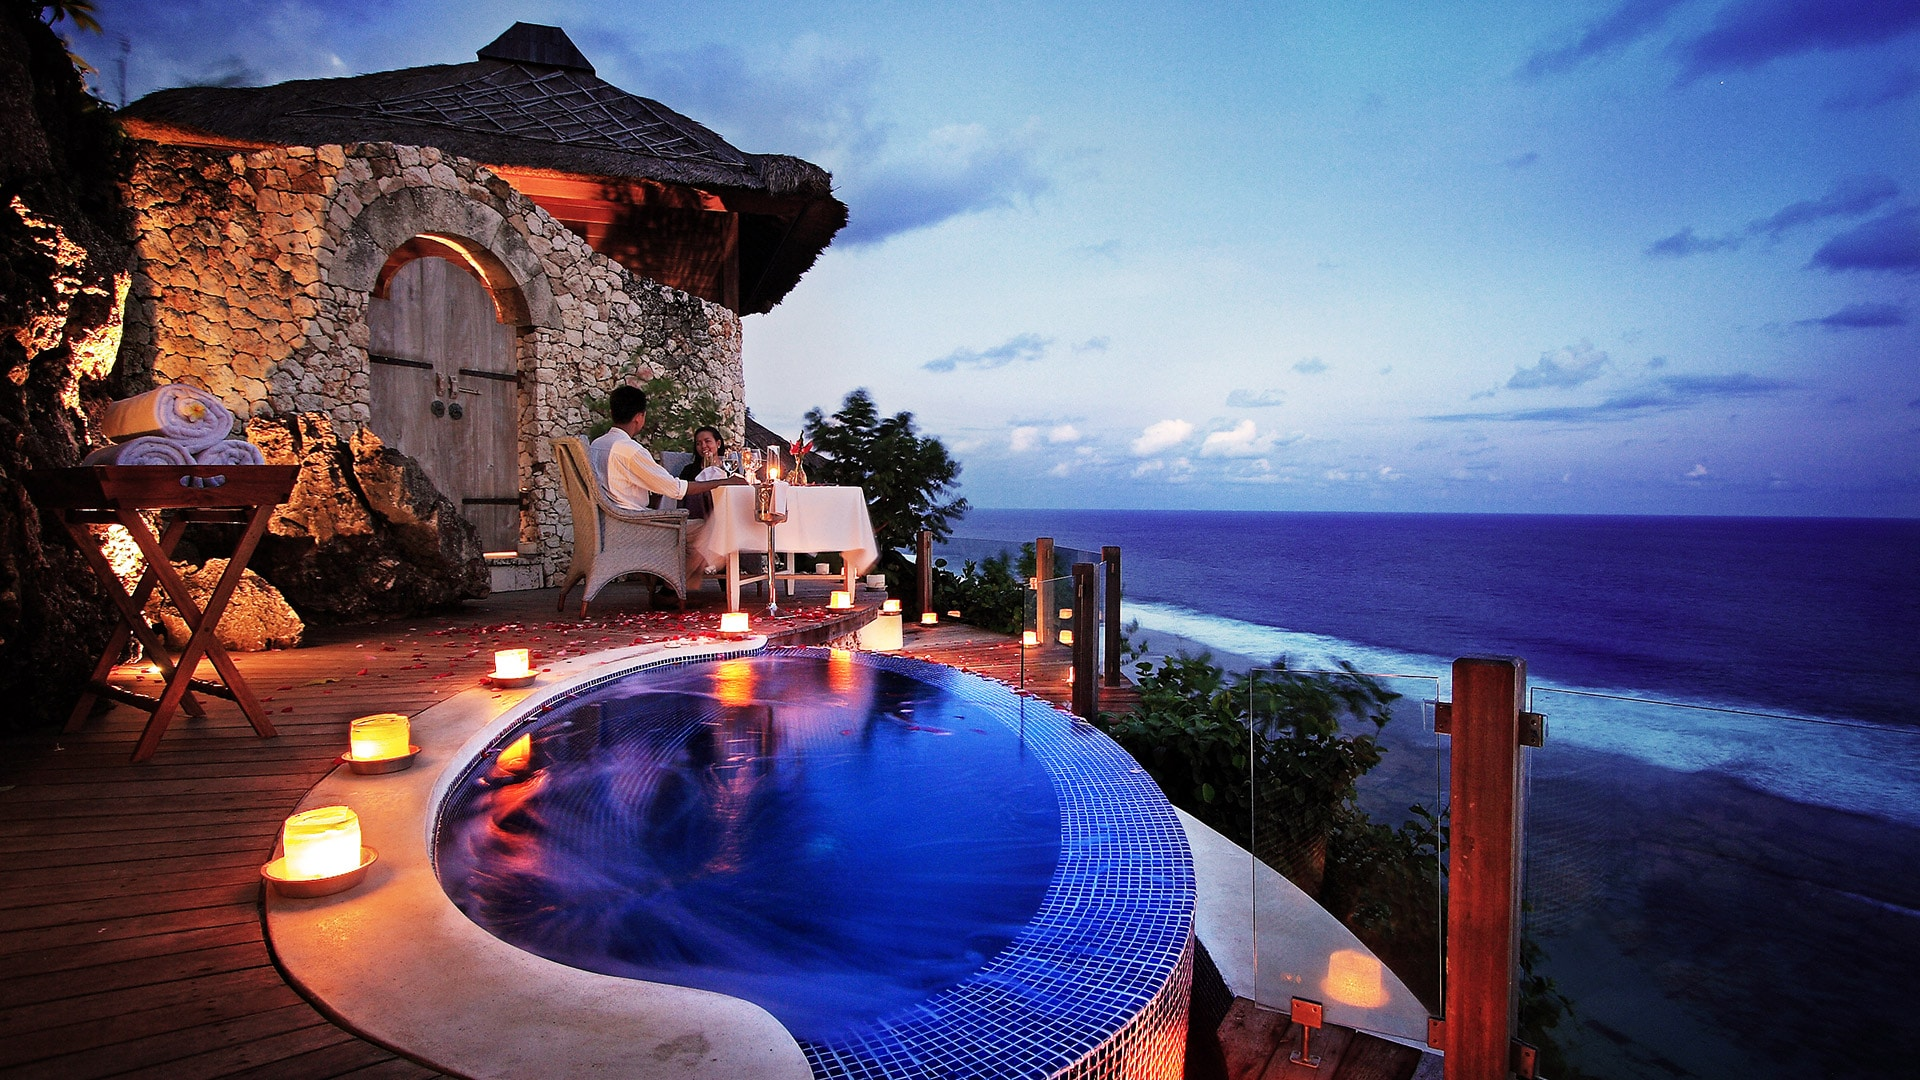 Top 10 Bali Beach Resorts | Travel Triangle